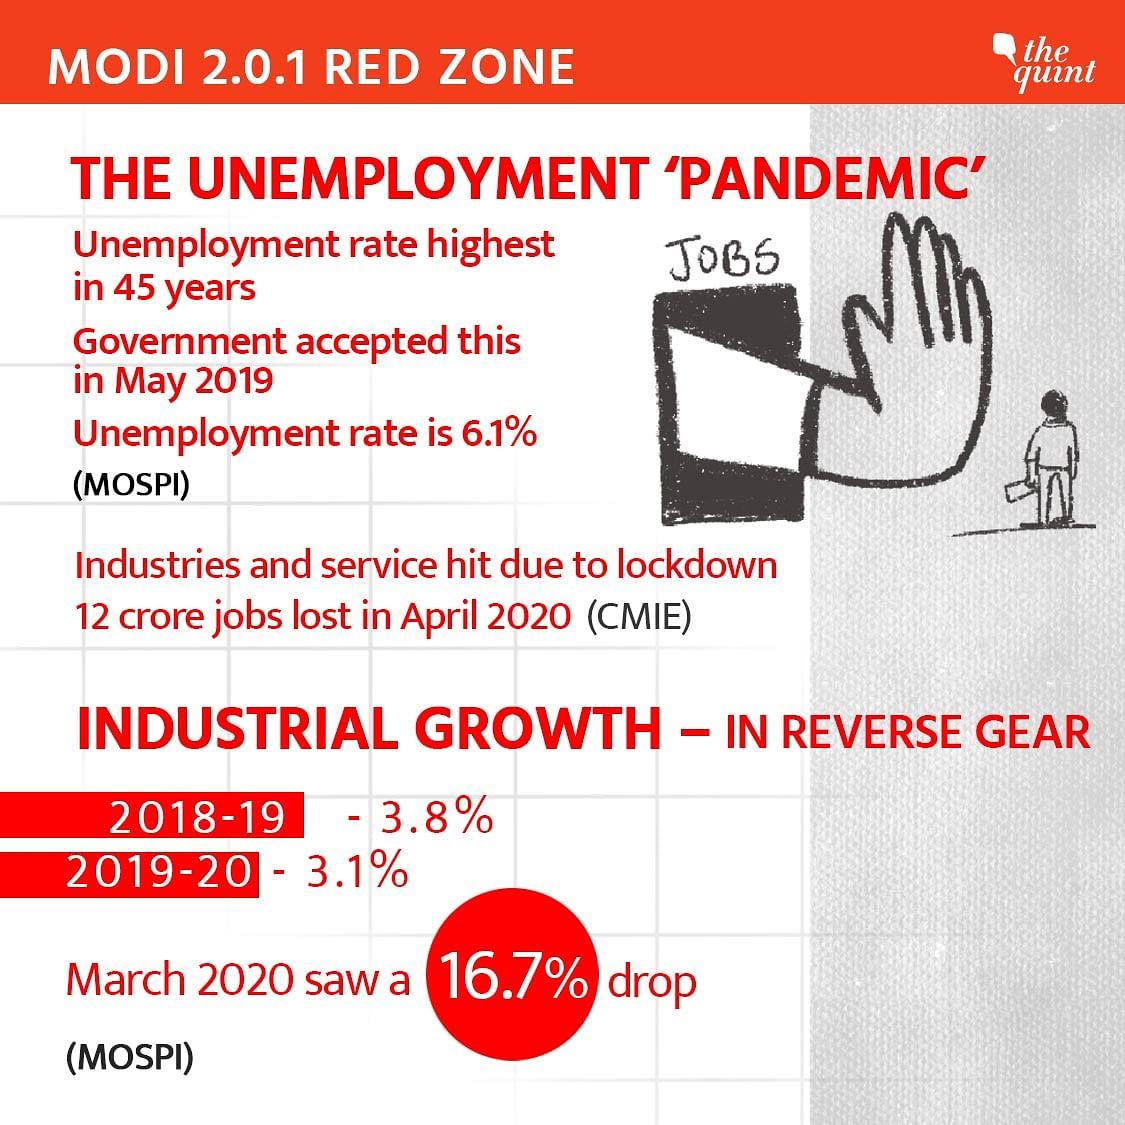 The unemployment 'pandemic'.